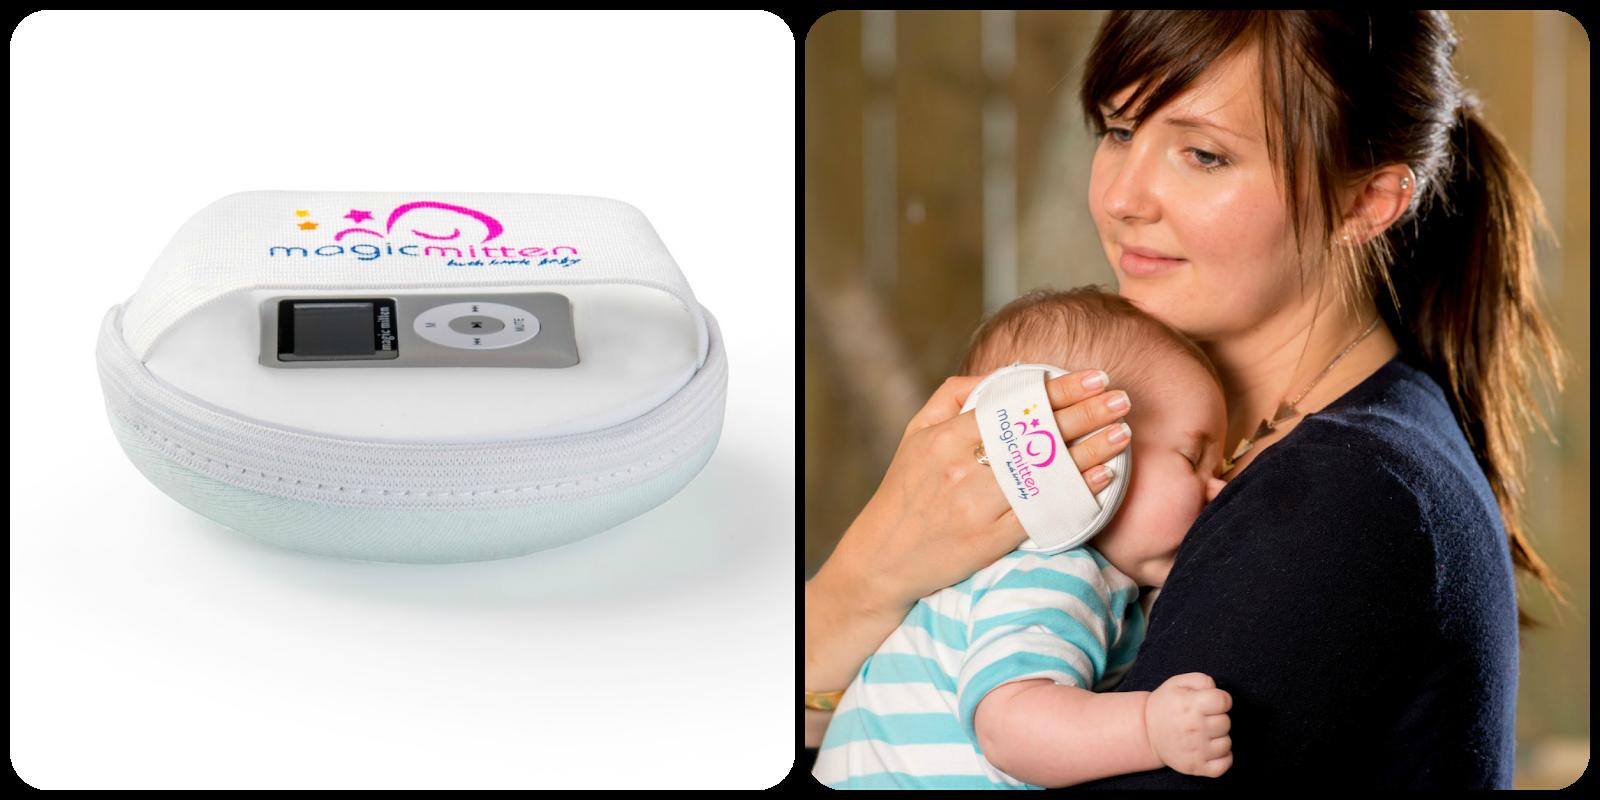 Top 10 Baby Gifts Uk : Handbags to change bags my top ten baby shower gift ideas